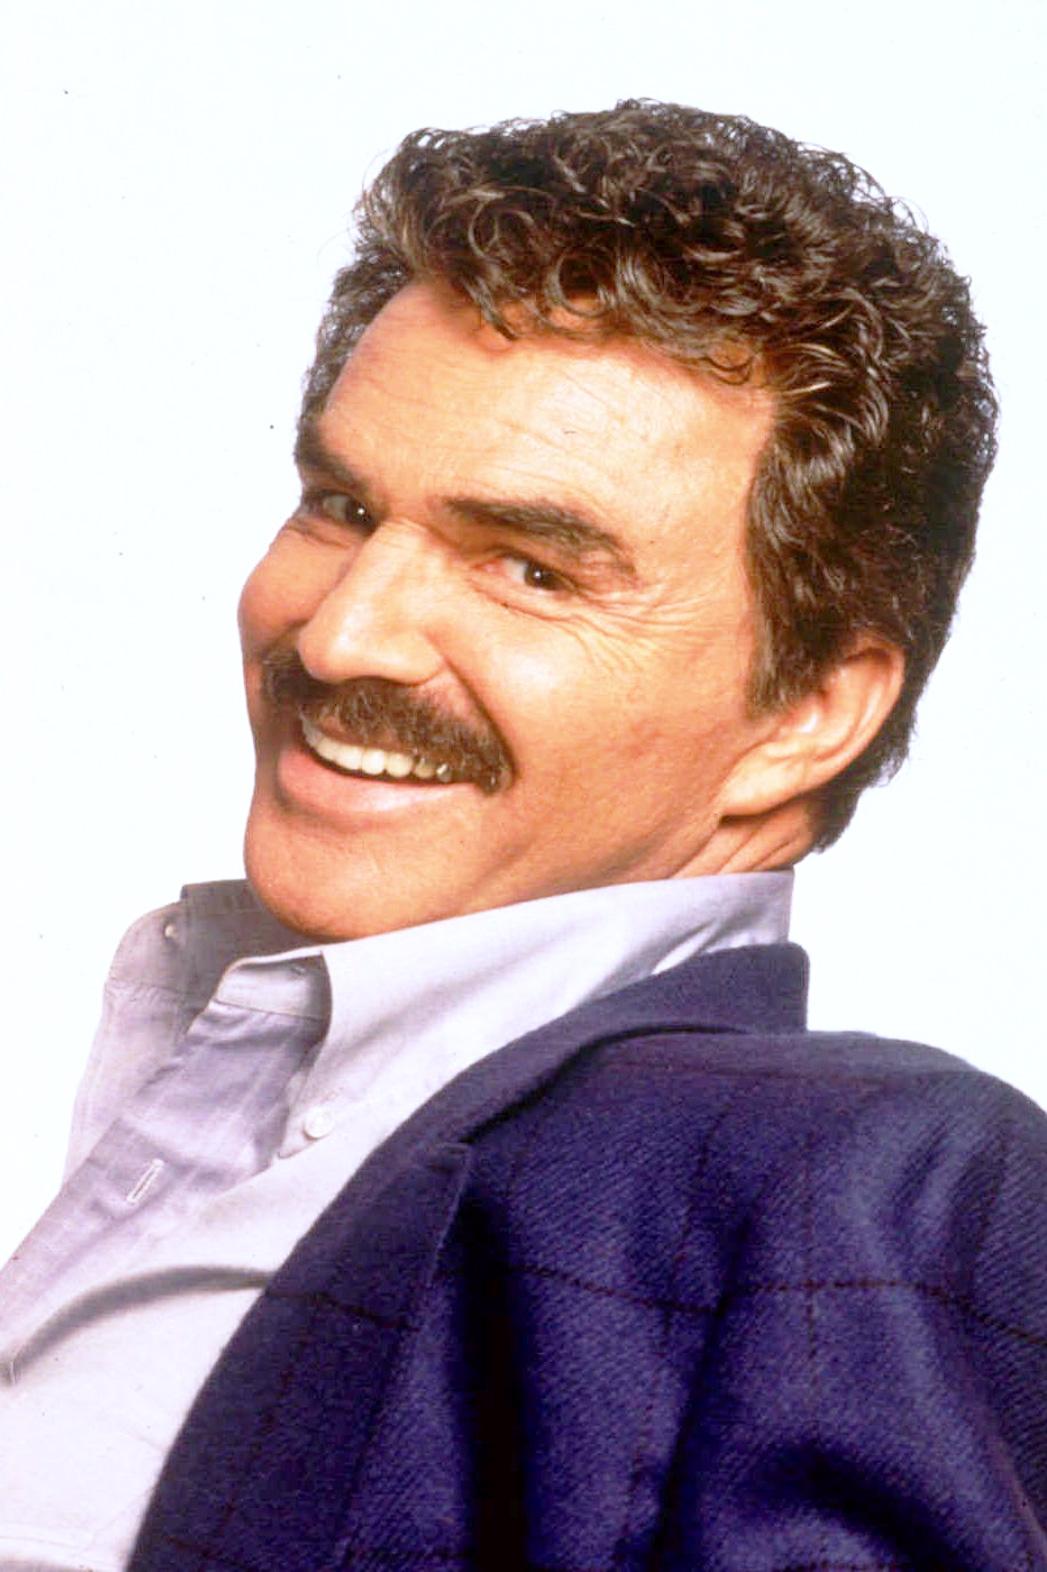 Burt Reynolds - P 2014